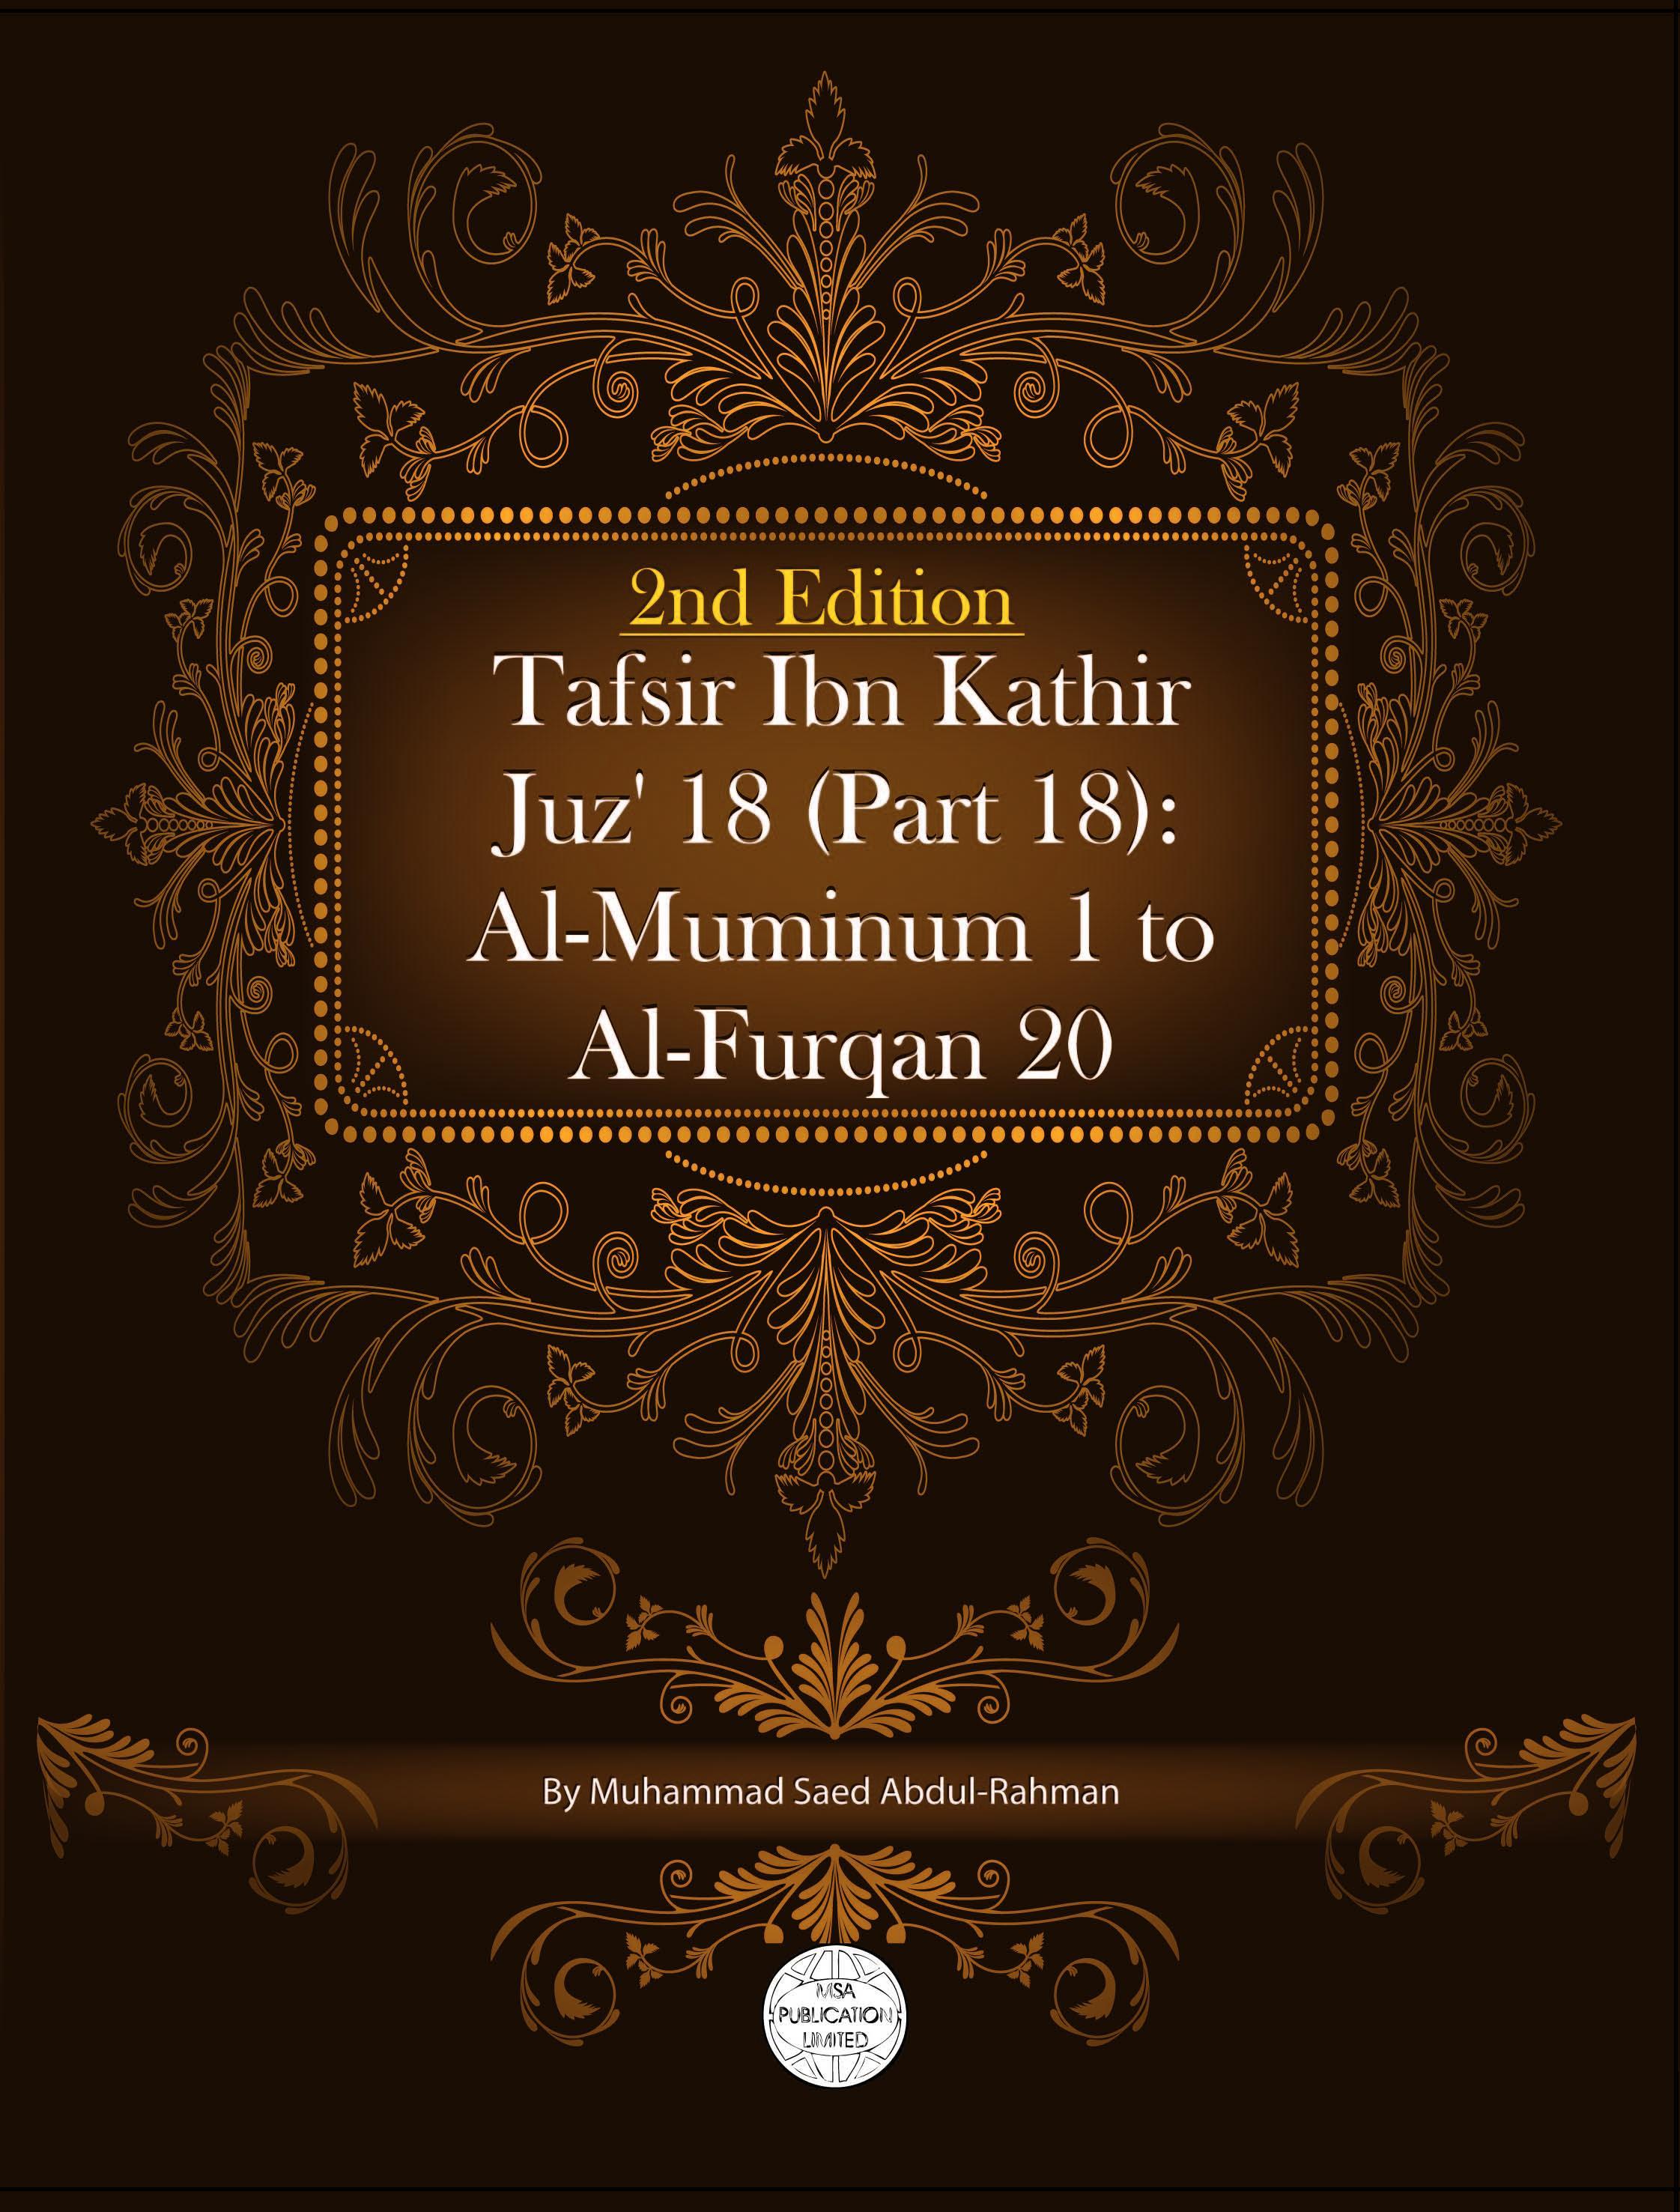 Tafsir Ibn Kathir Juz' 18 (Part 18): Al-Muminum 1 To Al-Furqan 20 2nd Edition